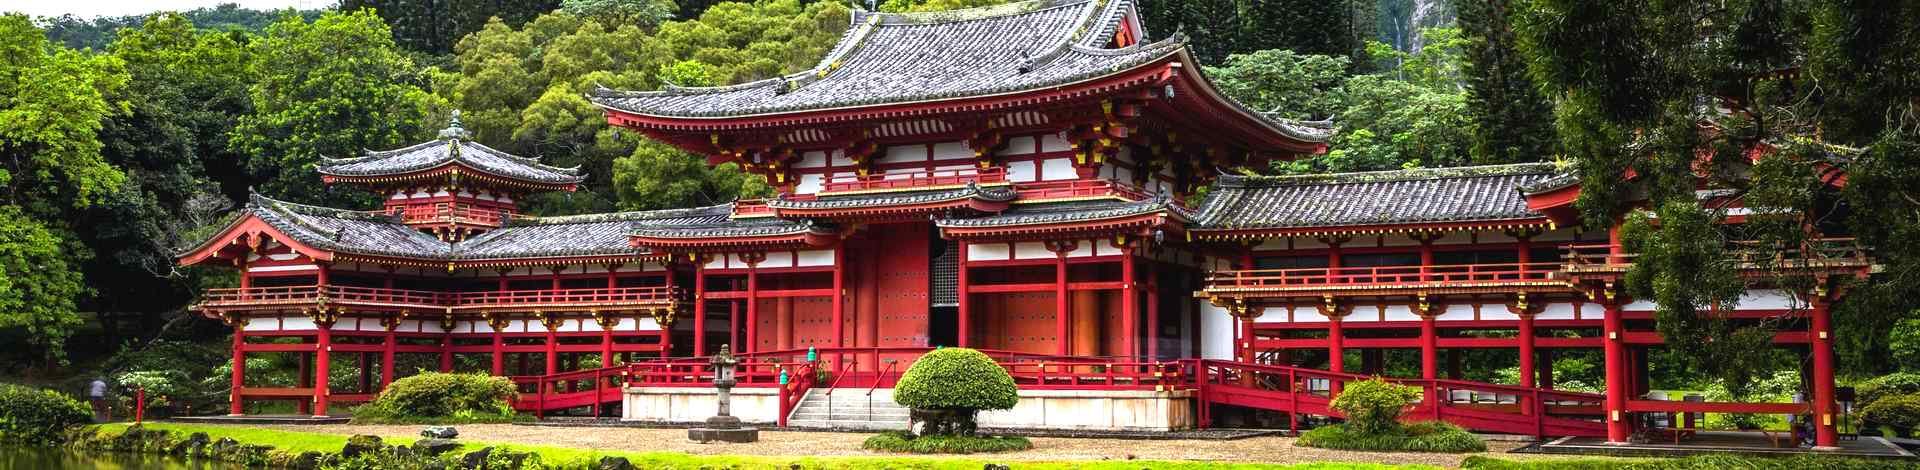 Voyage de luxe au Japon - Asie Online